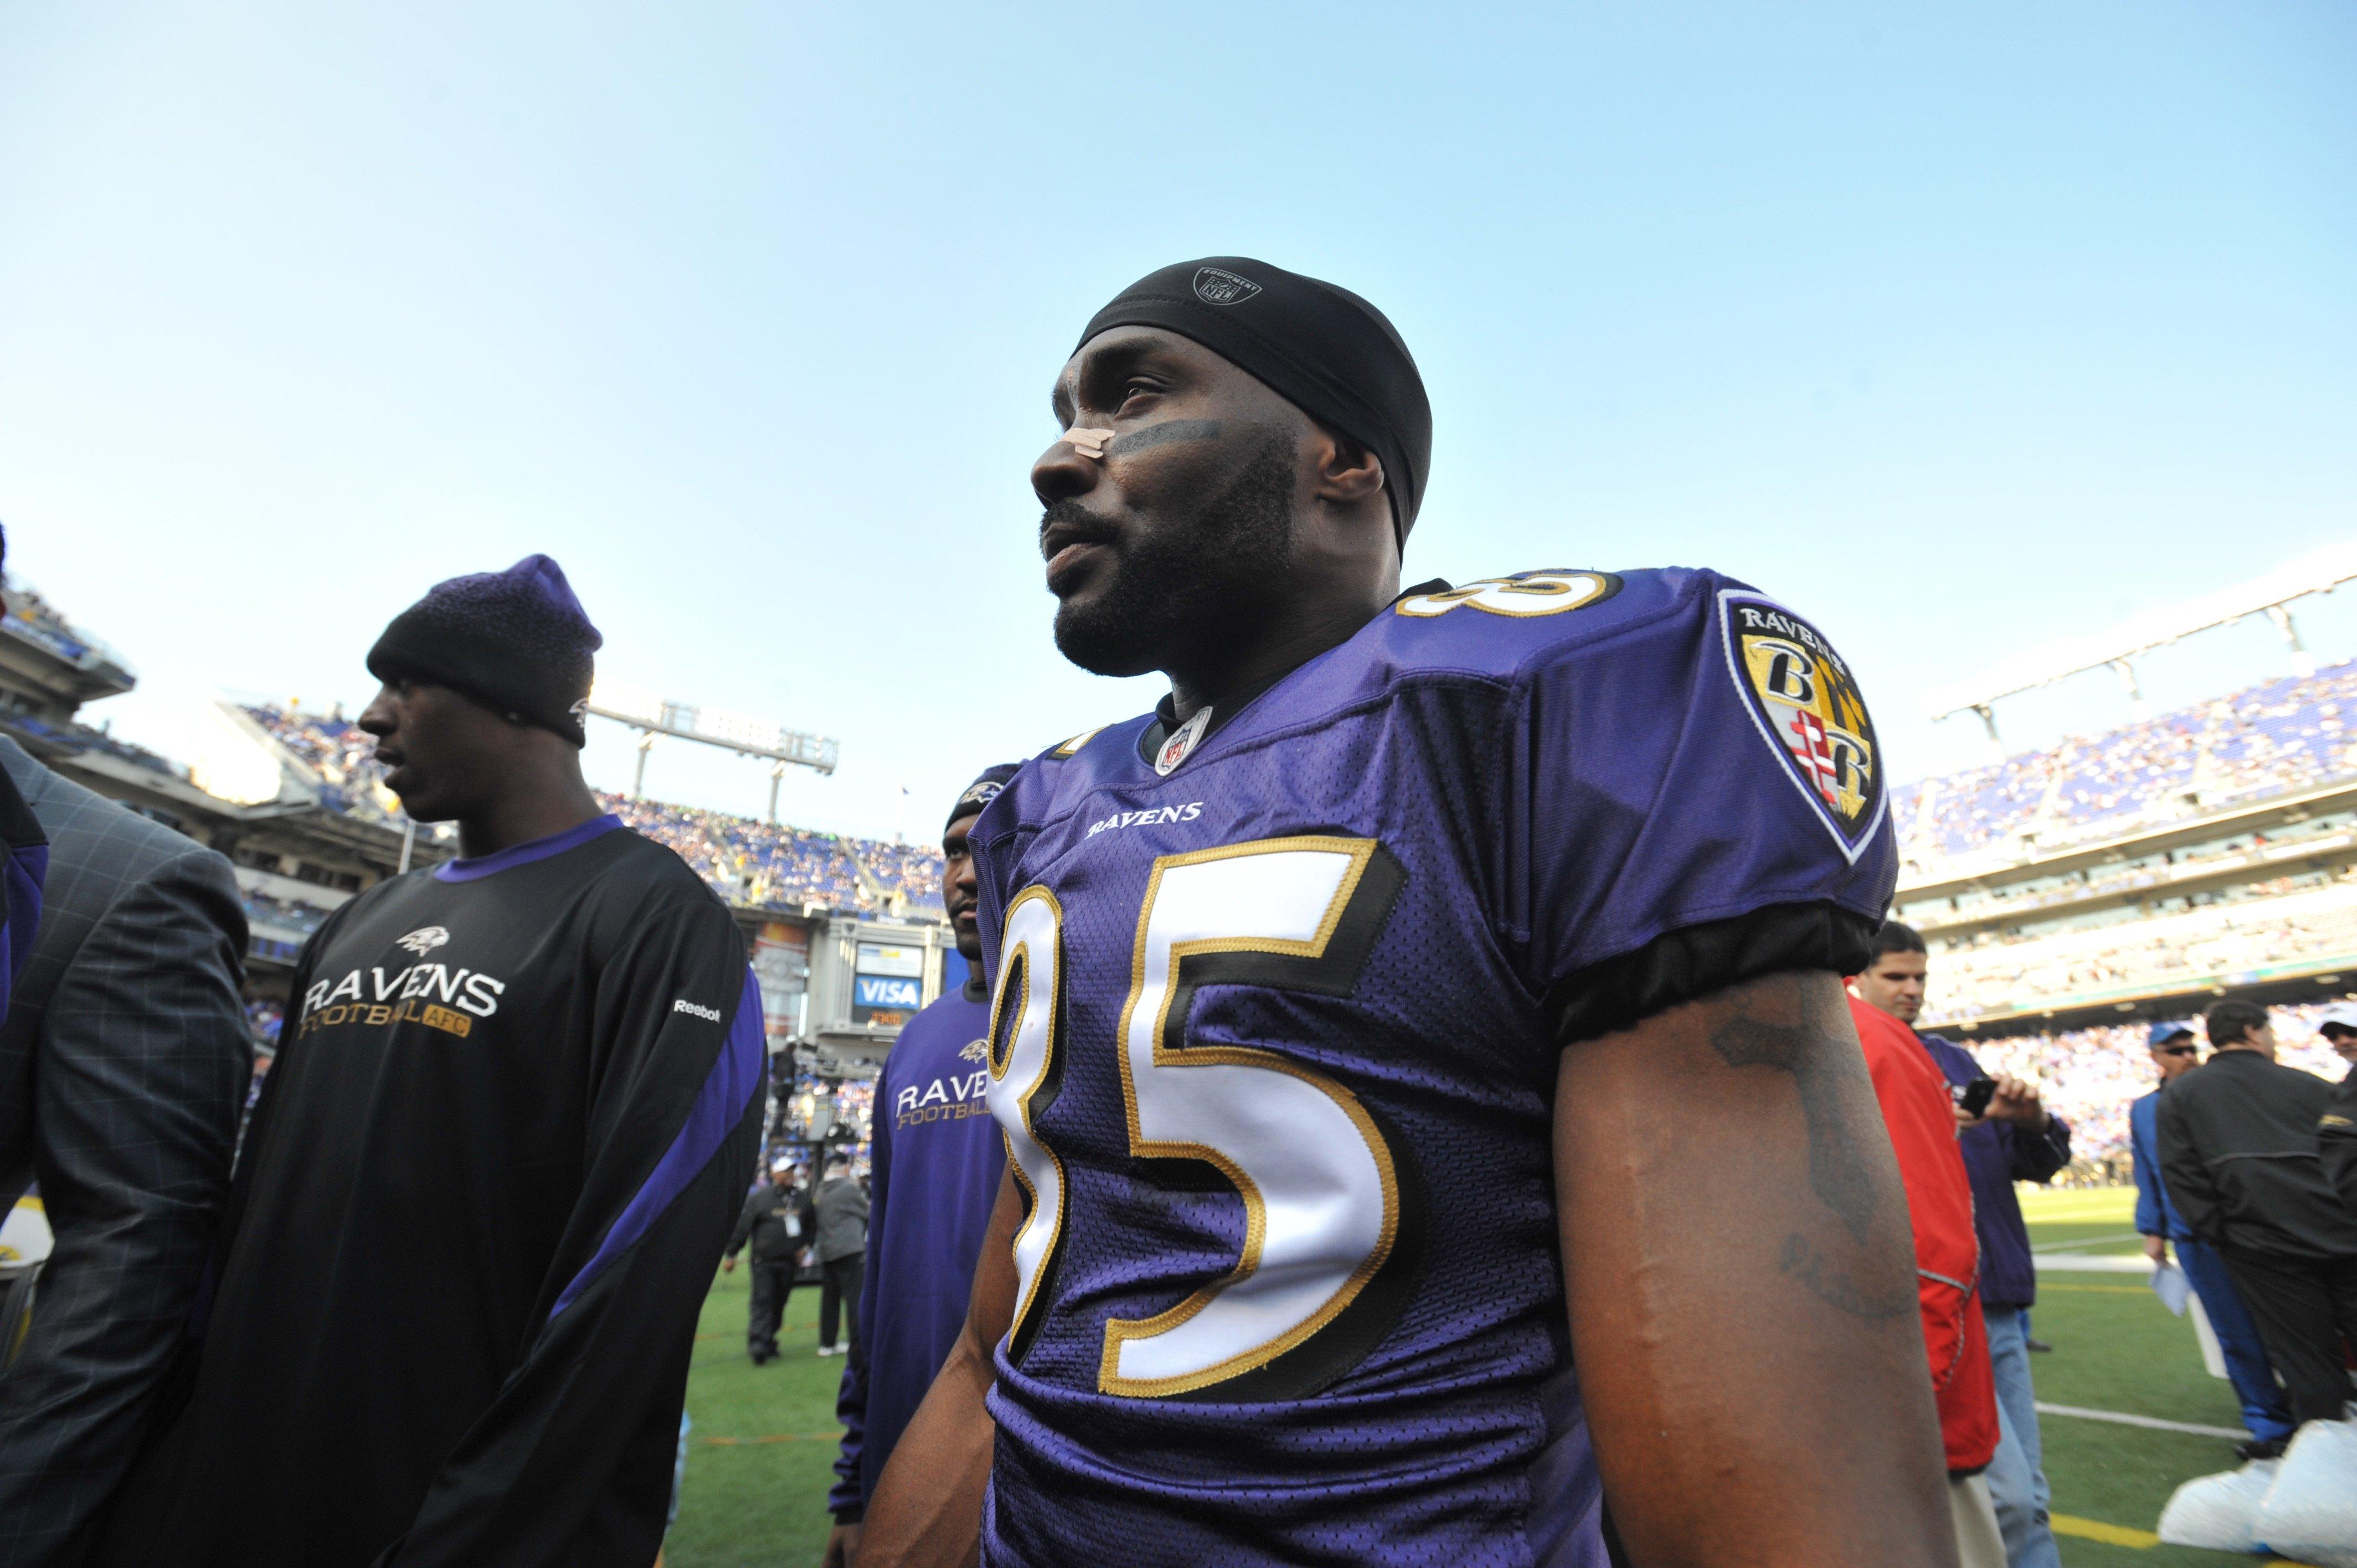 ac6b0e137bf BALTIMORE - NOVEMBER 22  Derrick Mason  85 of the Baltimore Ravens comes  off the